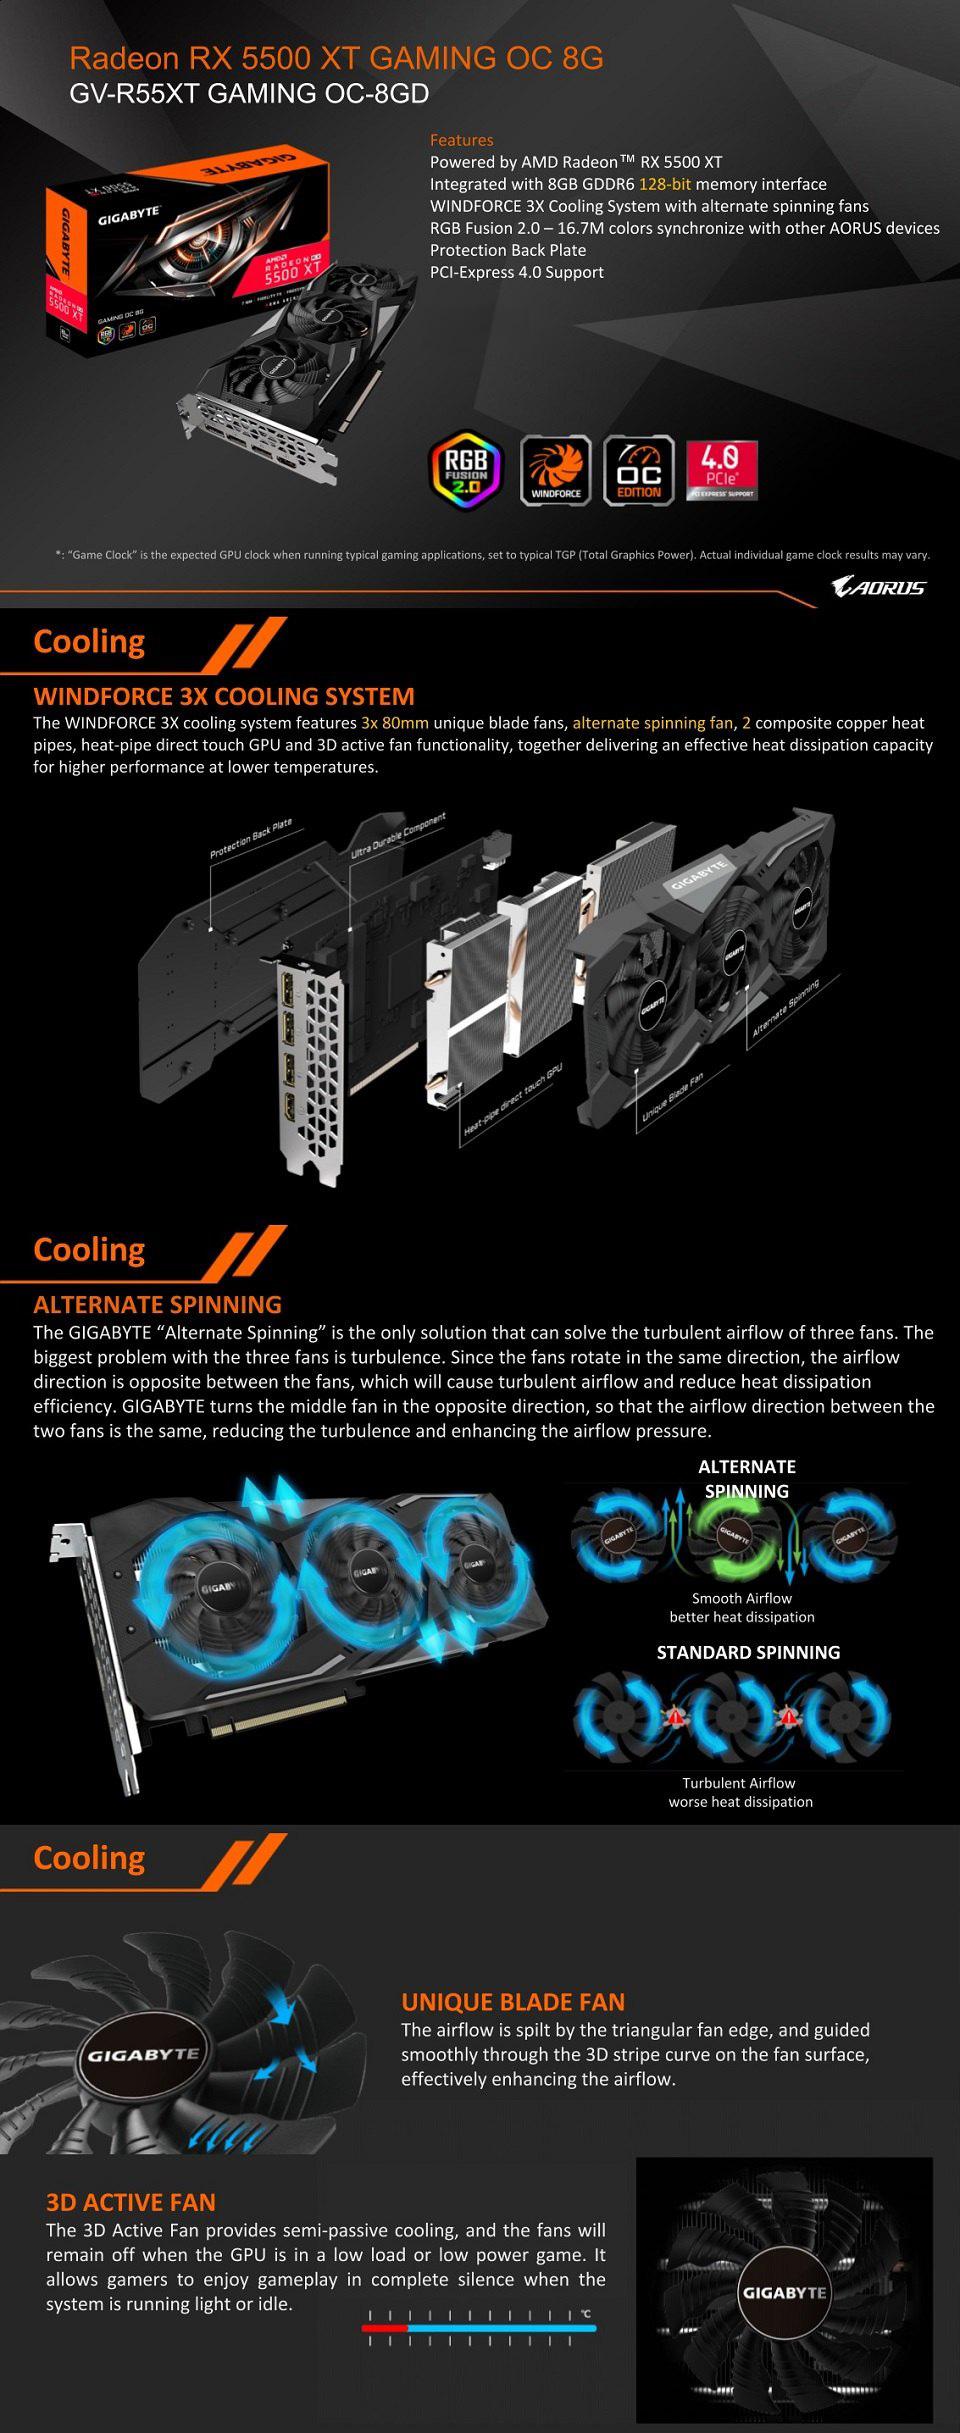 Gigabyte Radeon RX 5500 XT Gaming OC 8GB features